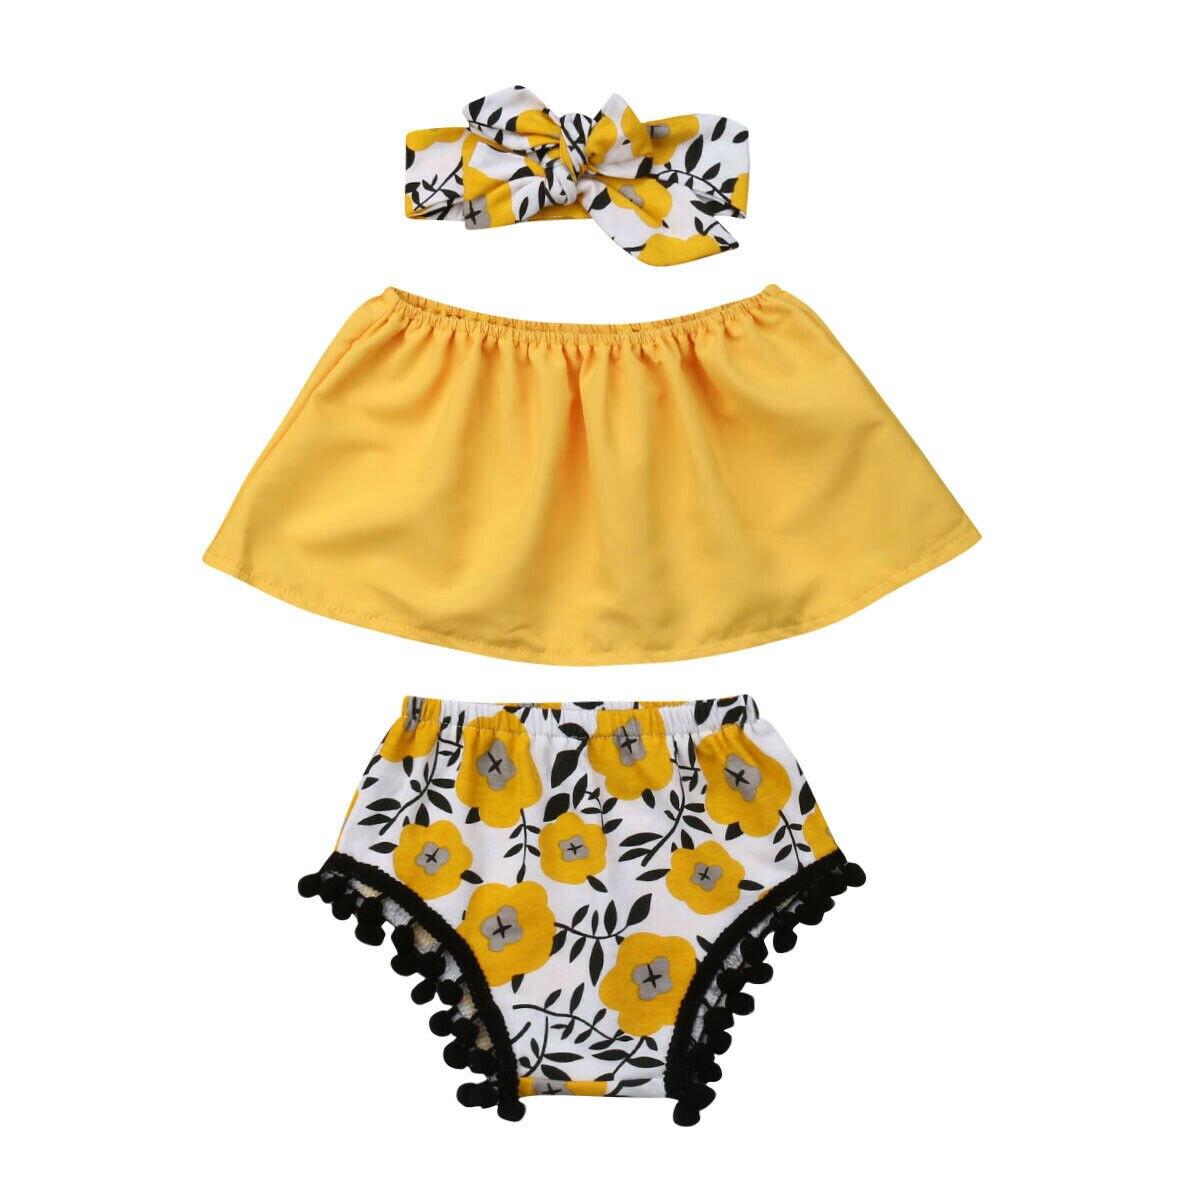 0-18 M Nette Neugeborene Baby Mädchen Off Schulter Crop Tops Floral Quaste Ball Baby Pumphose Shorts Stirnband 3 Pcs Sommer Kleidung Set